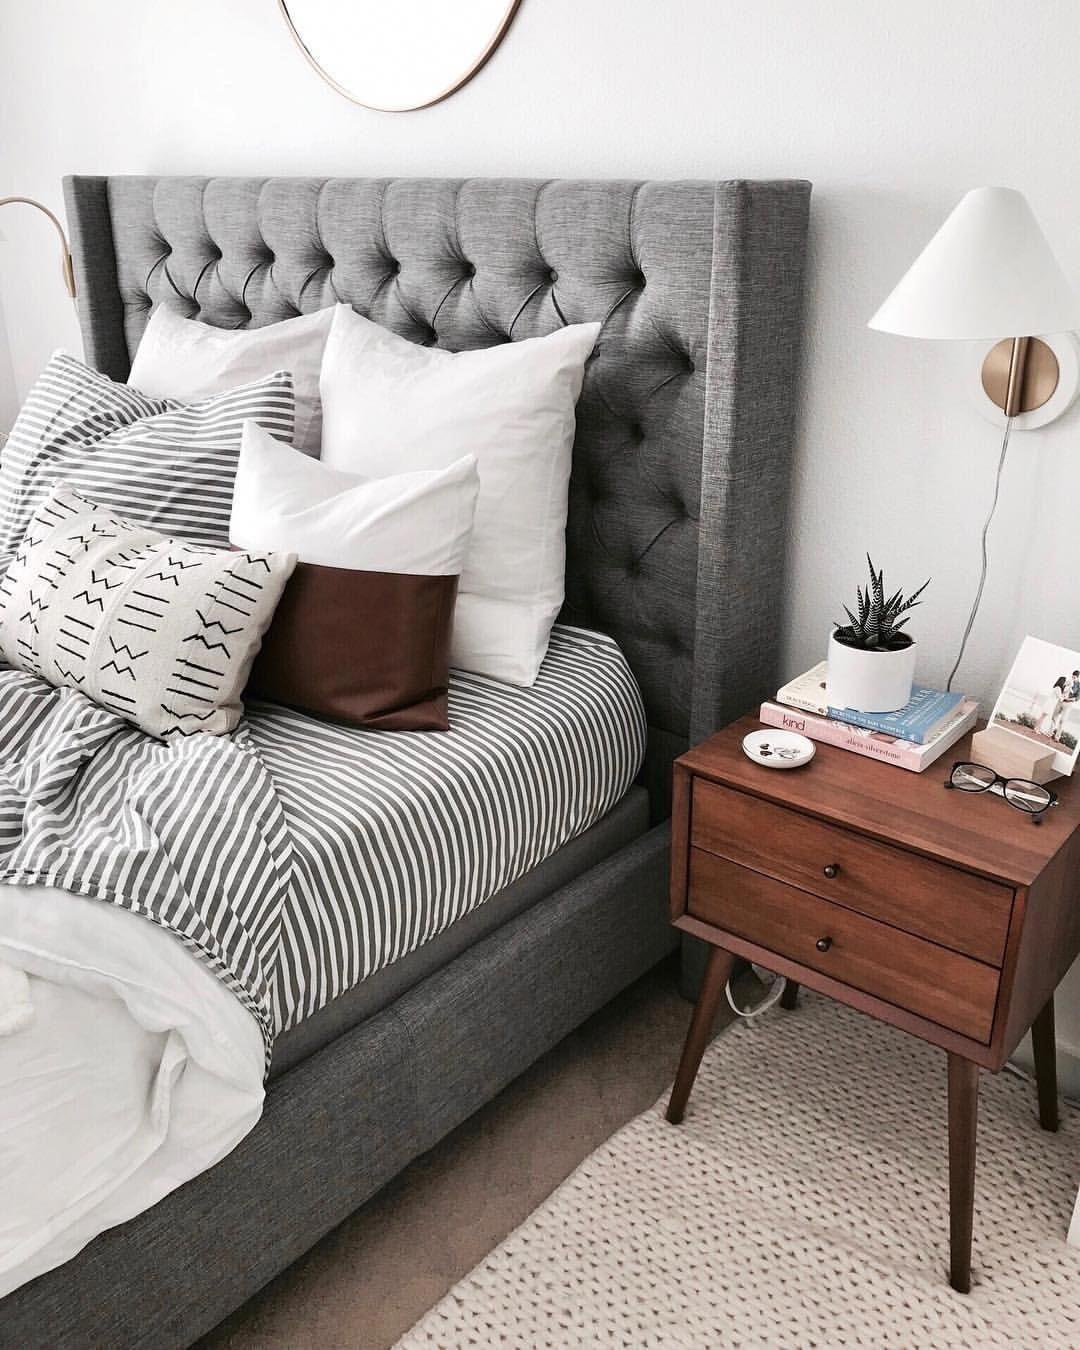 Grey Bedroom Ideas With Calm Situation: 8 Calm Ideas: Minimalist Home Style Grey Minimalist Decor